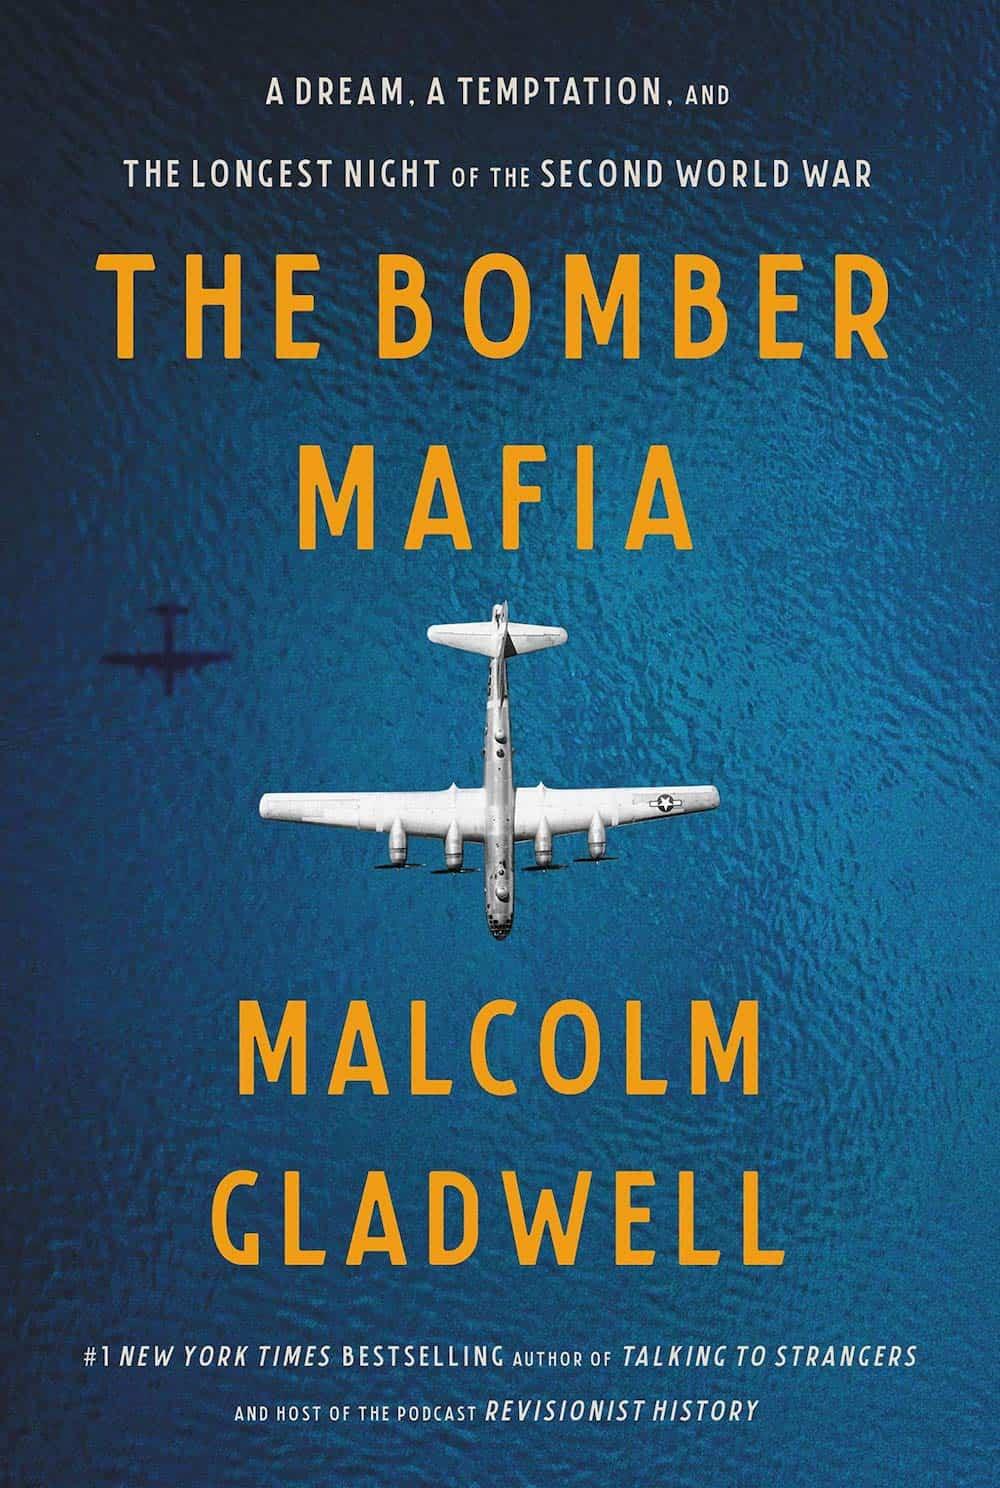 The cover of The Bomber Mafia